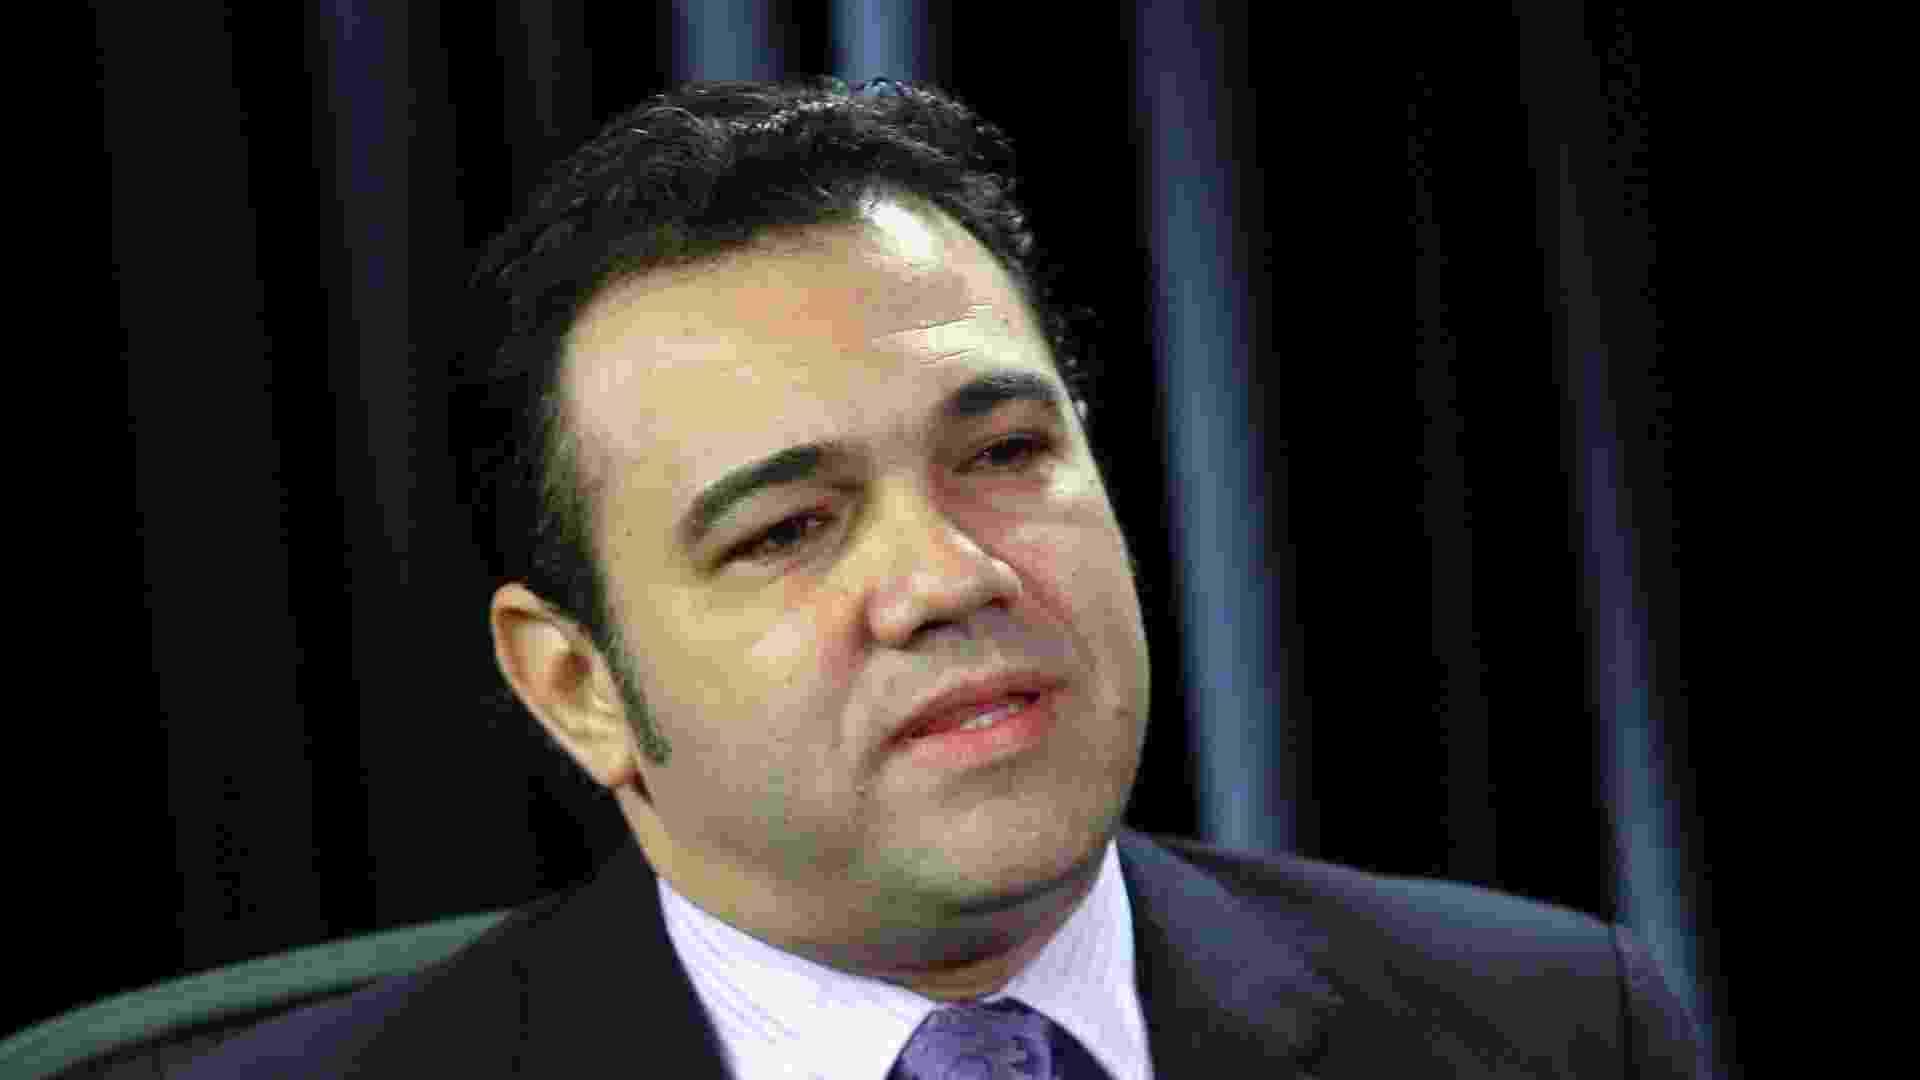 Marco Feliciano no Poder e Política - Alan Marques 1.abr.2013/Folhapress